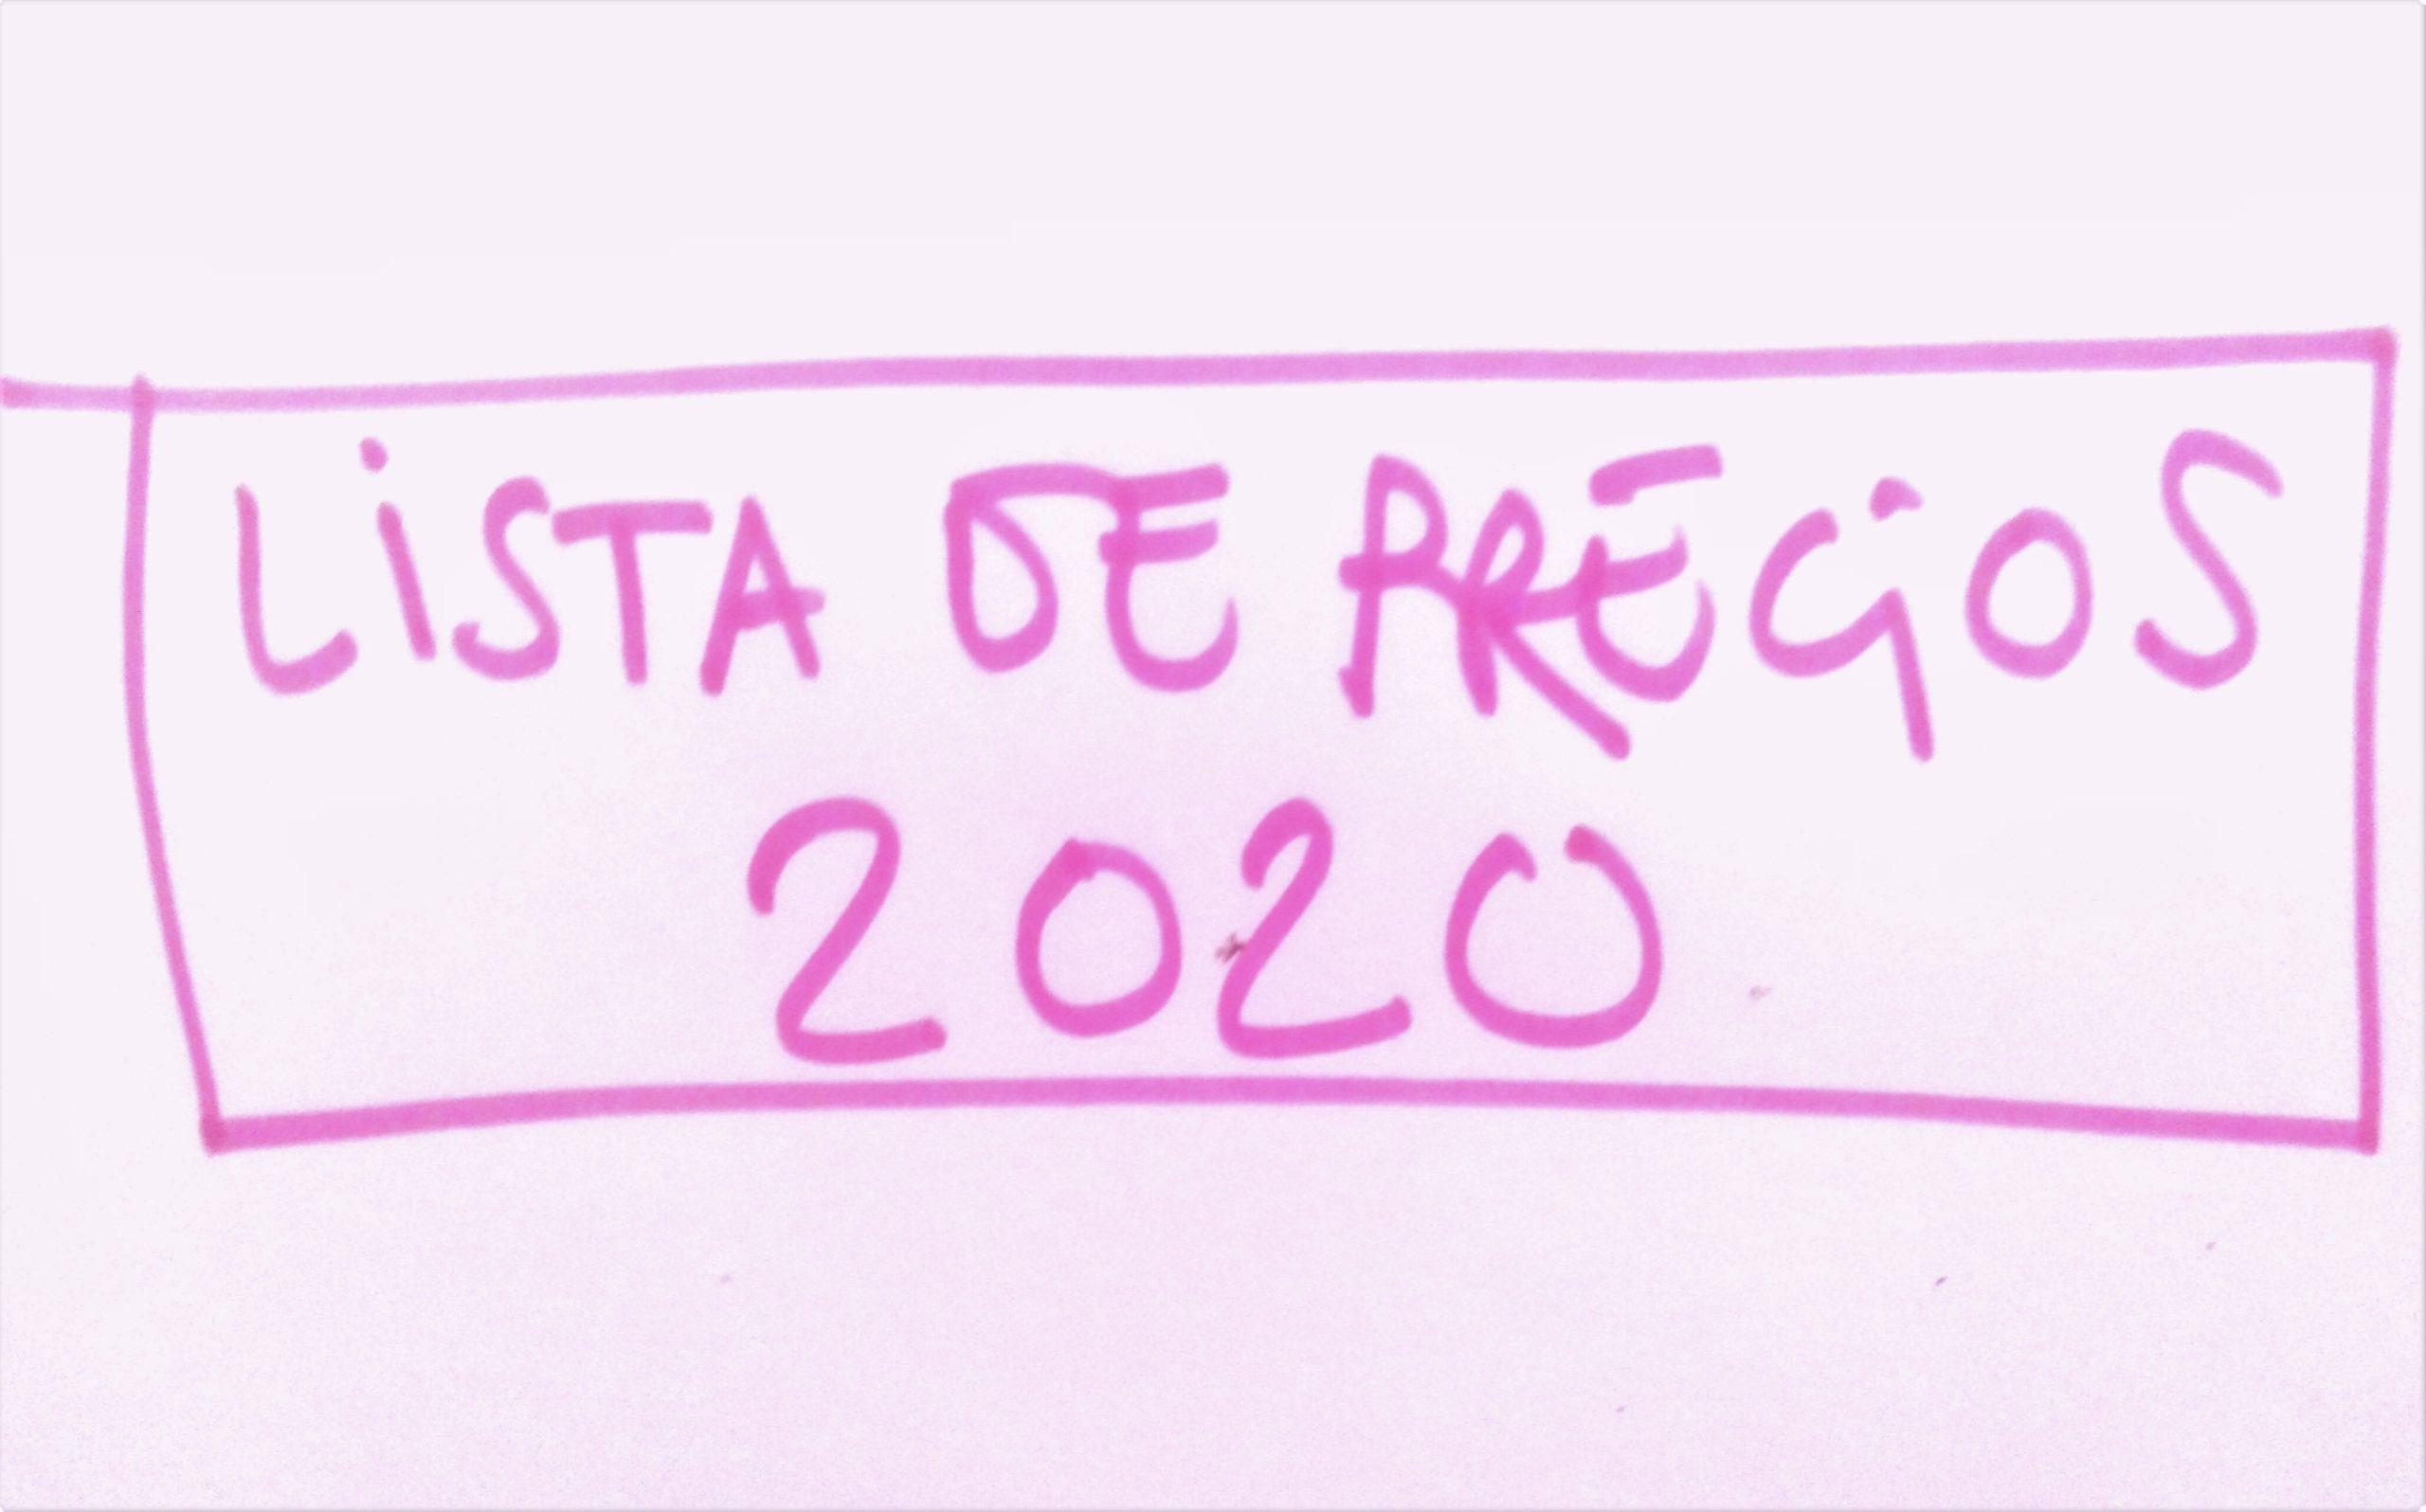 LISTA DE PRECIOS 2020.